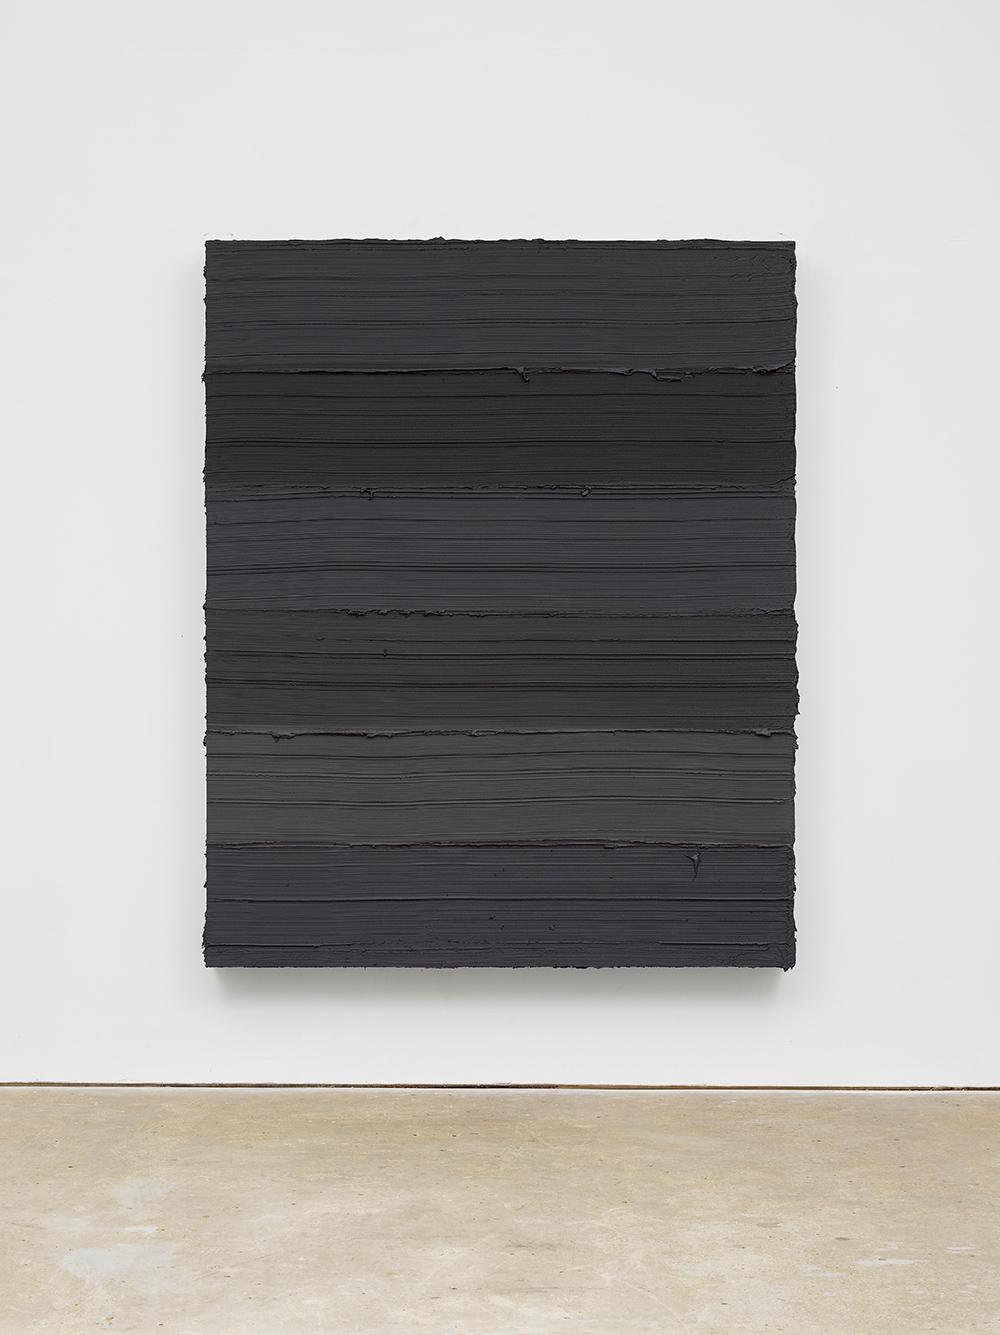 Jason Martin, Untitled (Cobalt blue deep / Stil de grain / Graphite grey), 2019. Oil on aluminium 220 x 180 cm 86 1/2 x 70 3/4 in © Jason Martin. Courtesy Lisson Gallery